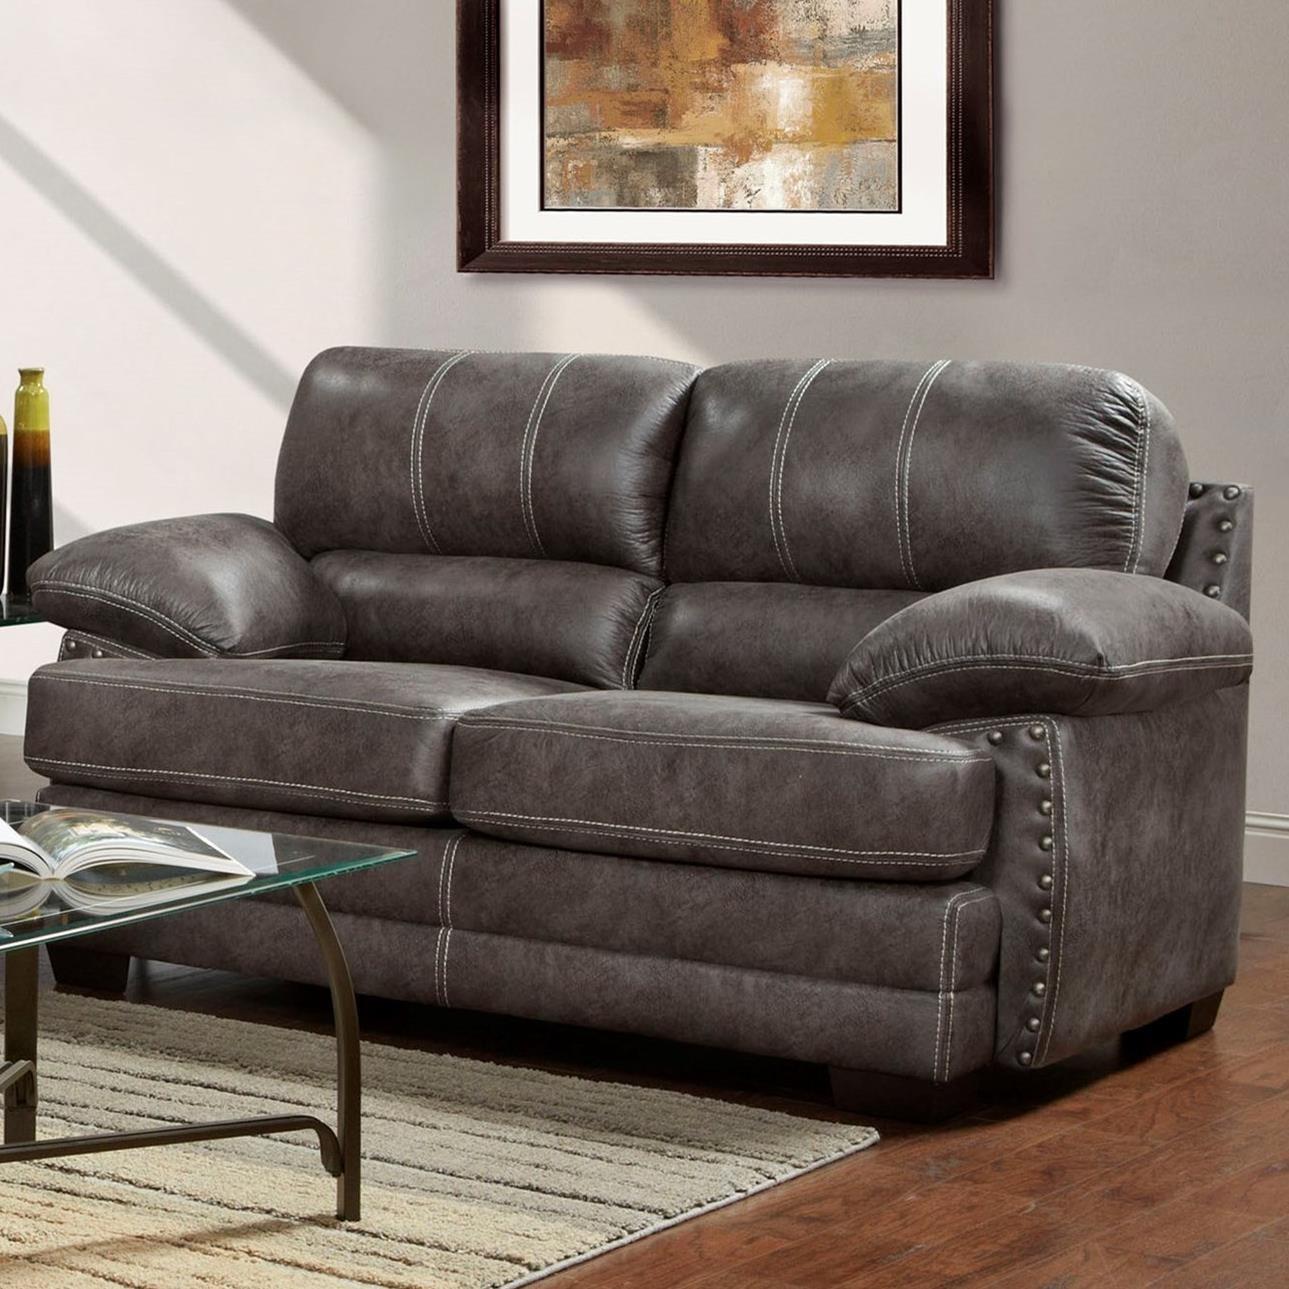 1650 Love Seat by Washington Furniture at Lynn's Furniture & Mattress